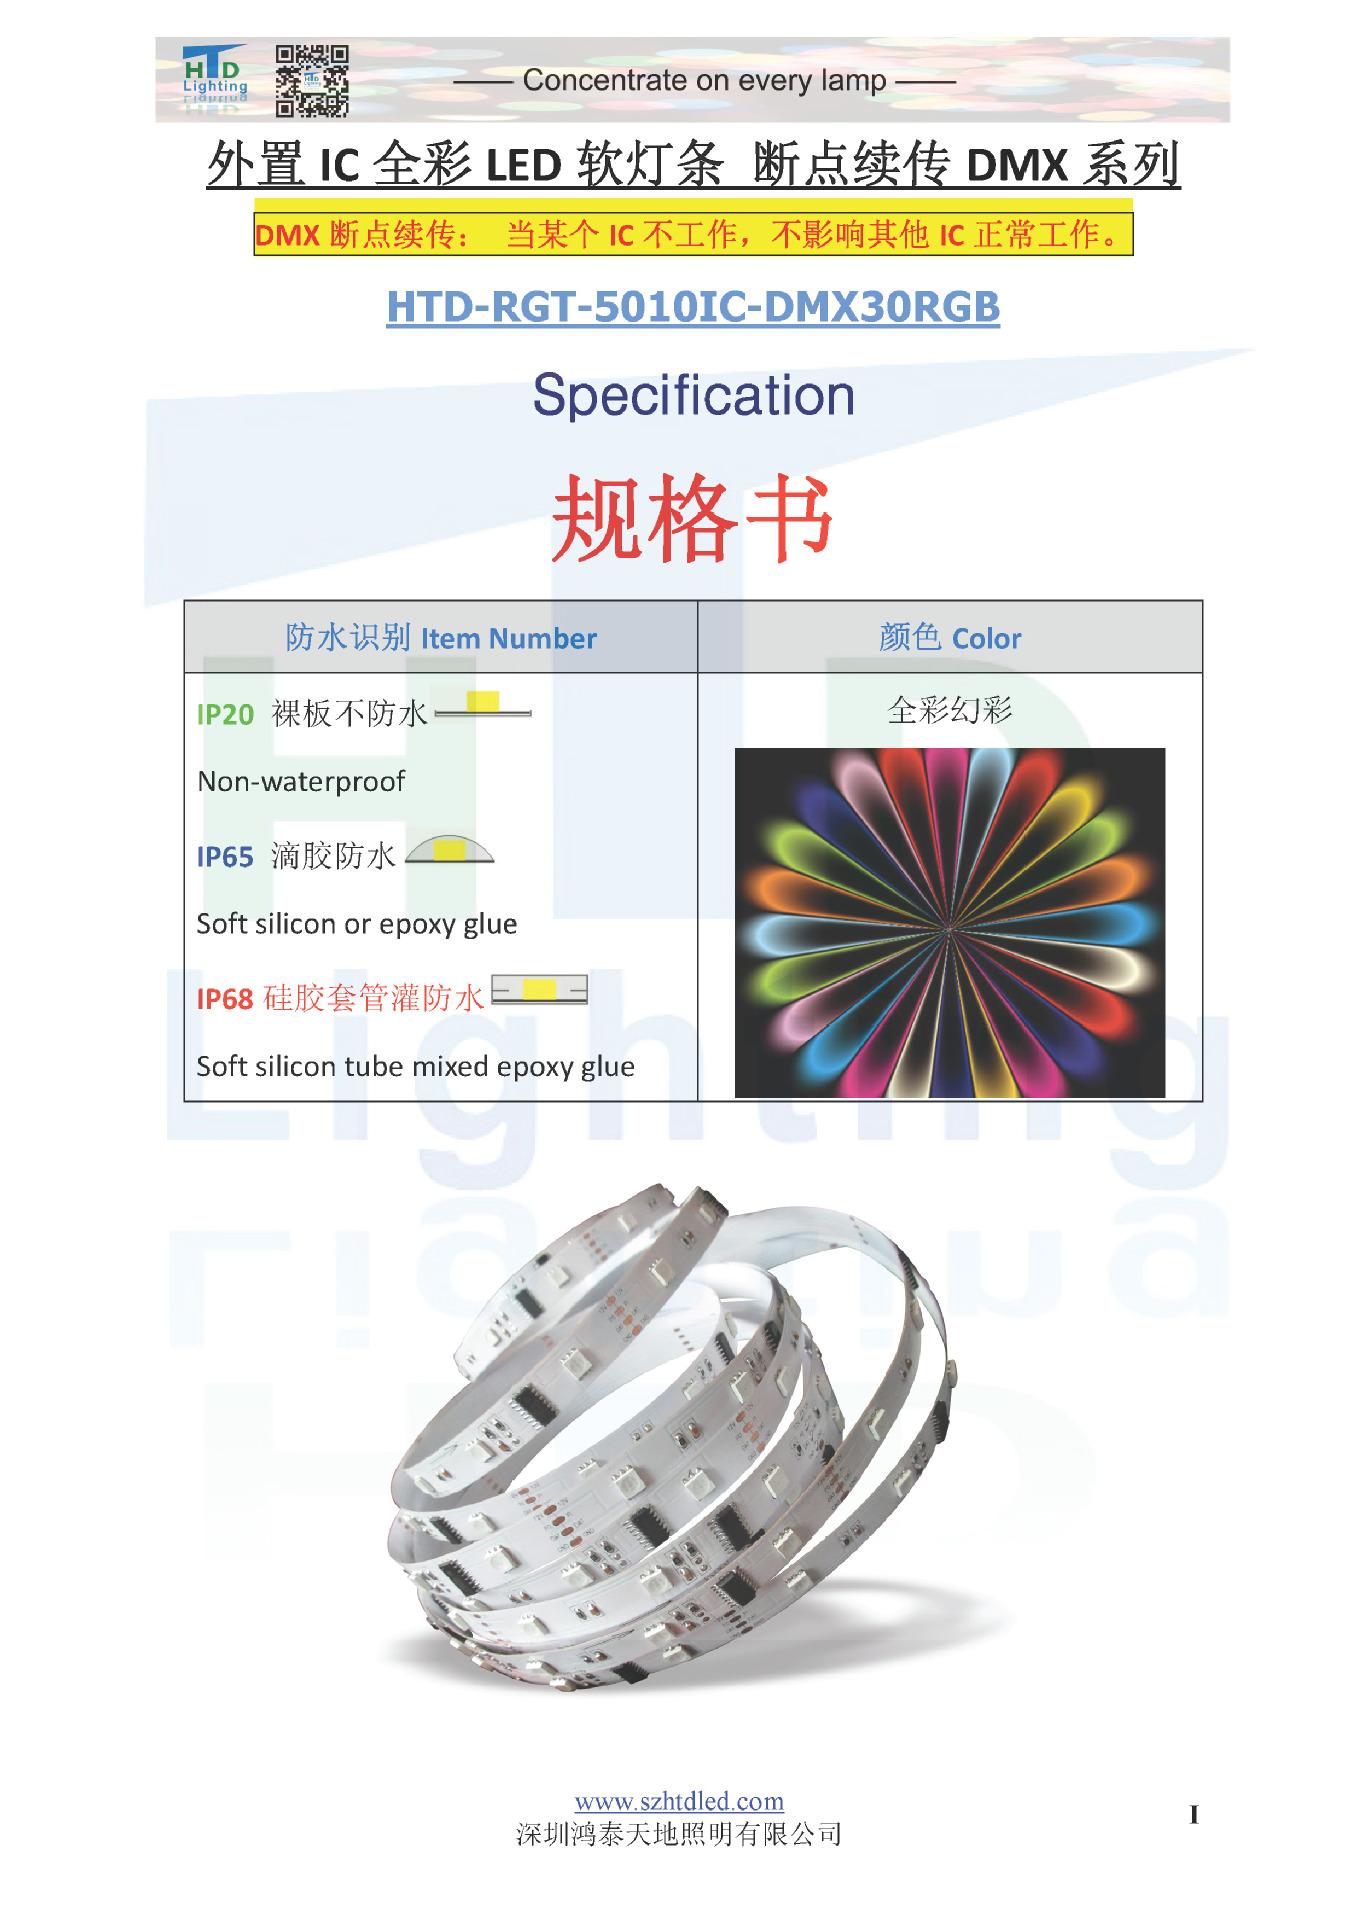 (中文)HTD-RGT-5010IC-DMX30RGB DM